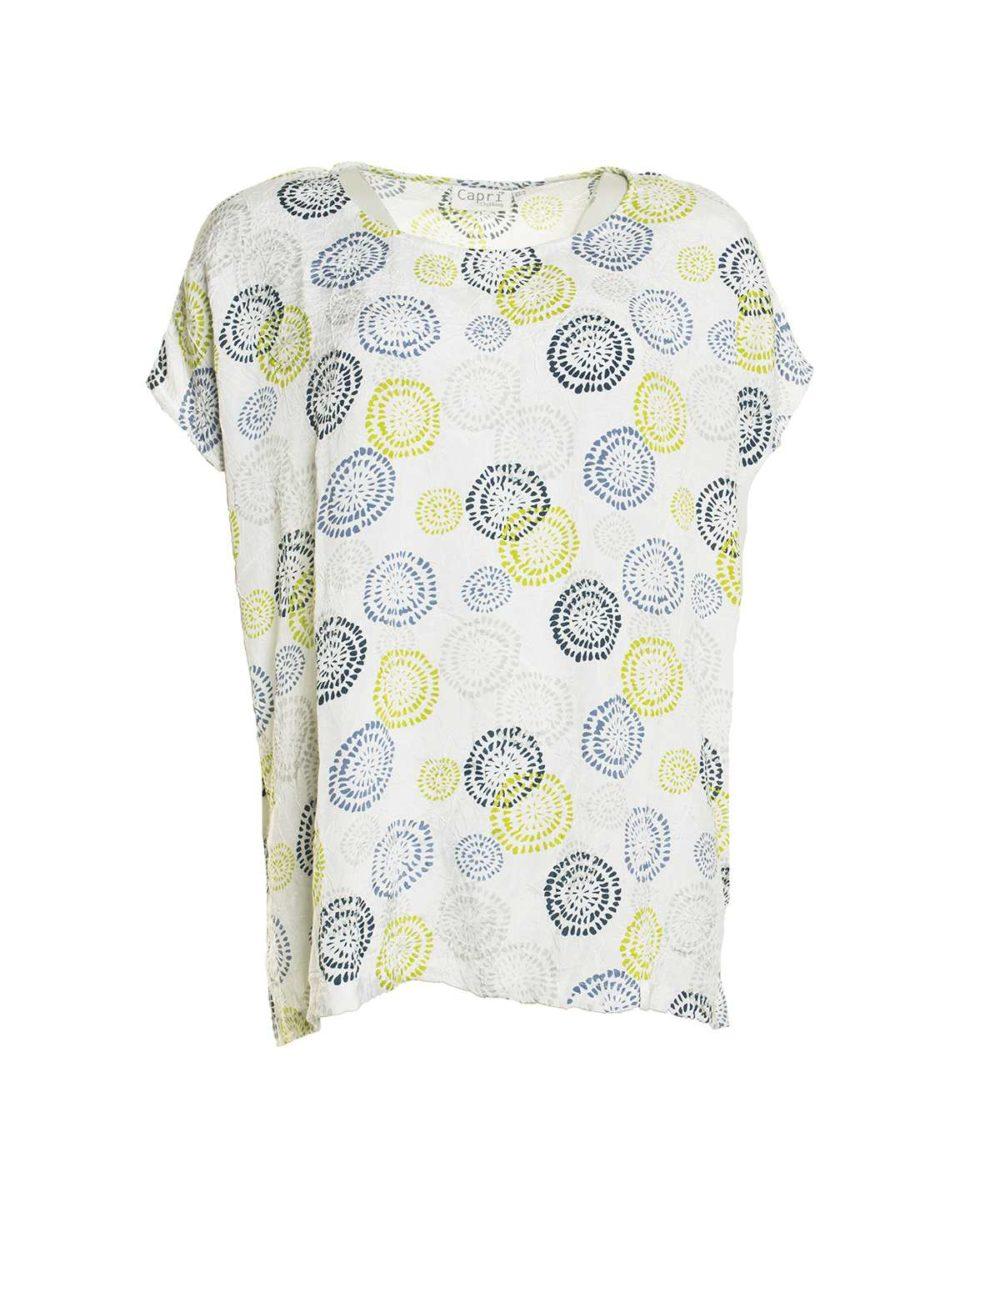 Top AML-8062 Capri Katie Kerr Women's Clothing